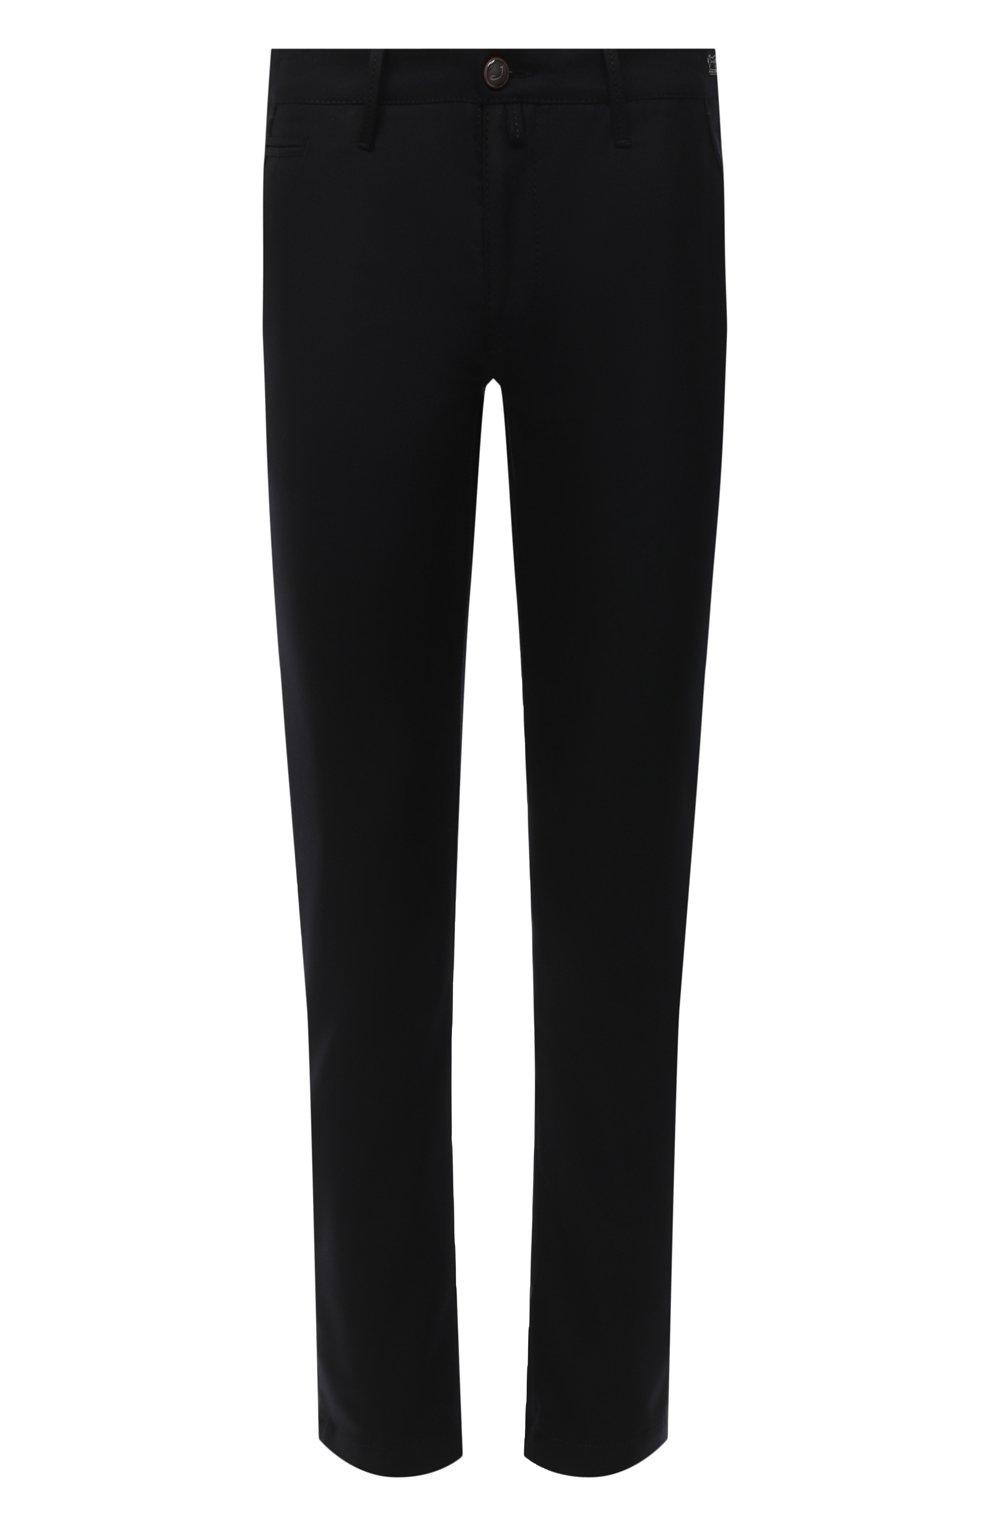 Мужские шерстяные брюки JACOB COHEN черного цвета, арт. B0BBY W00L 06968-N/54   Фото 1